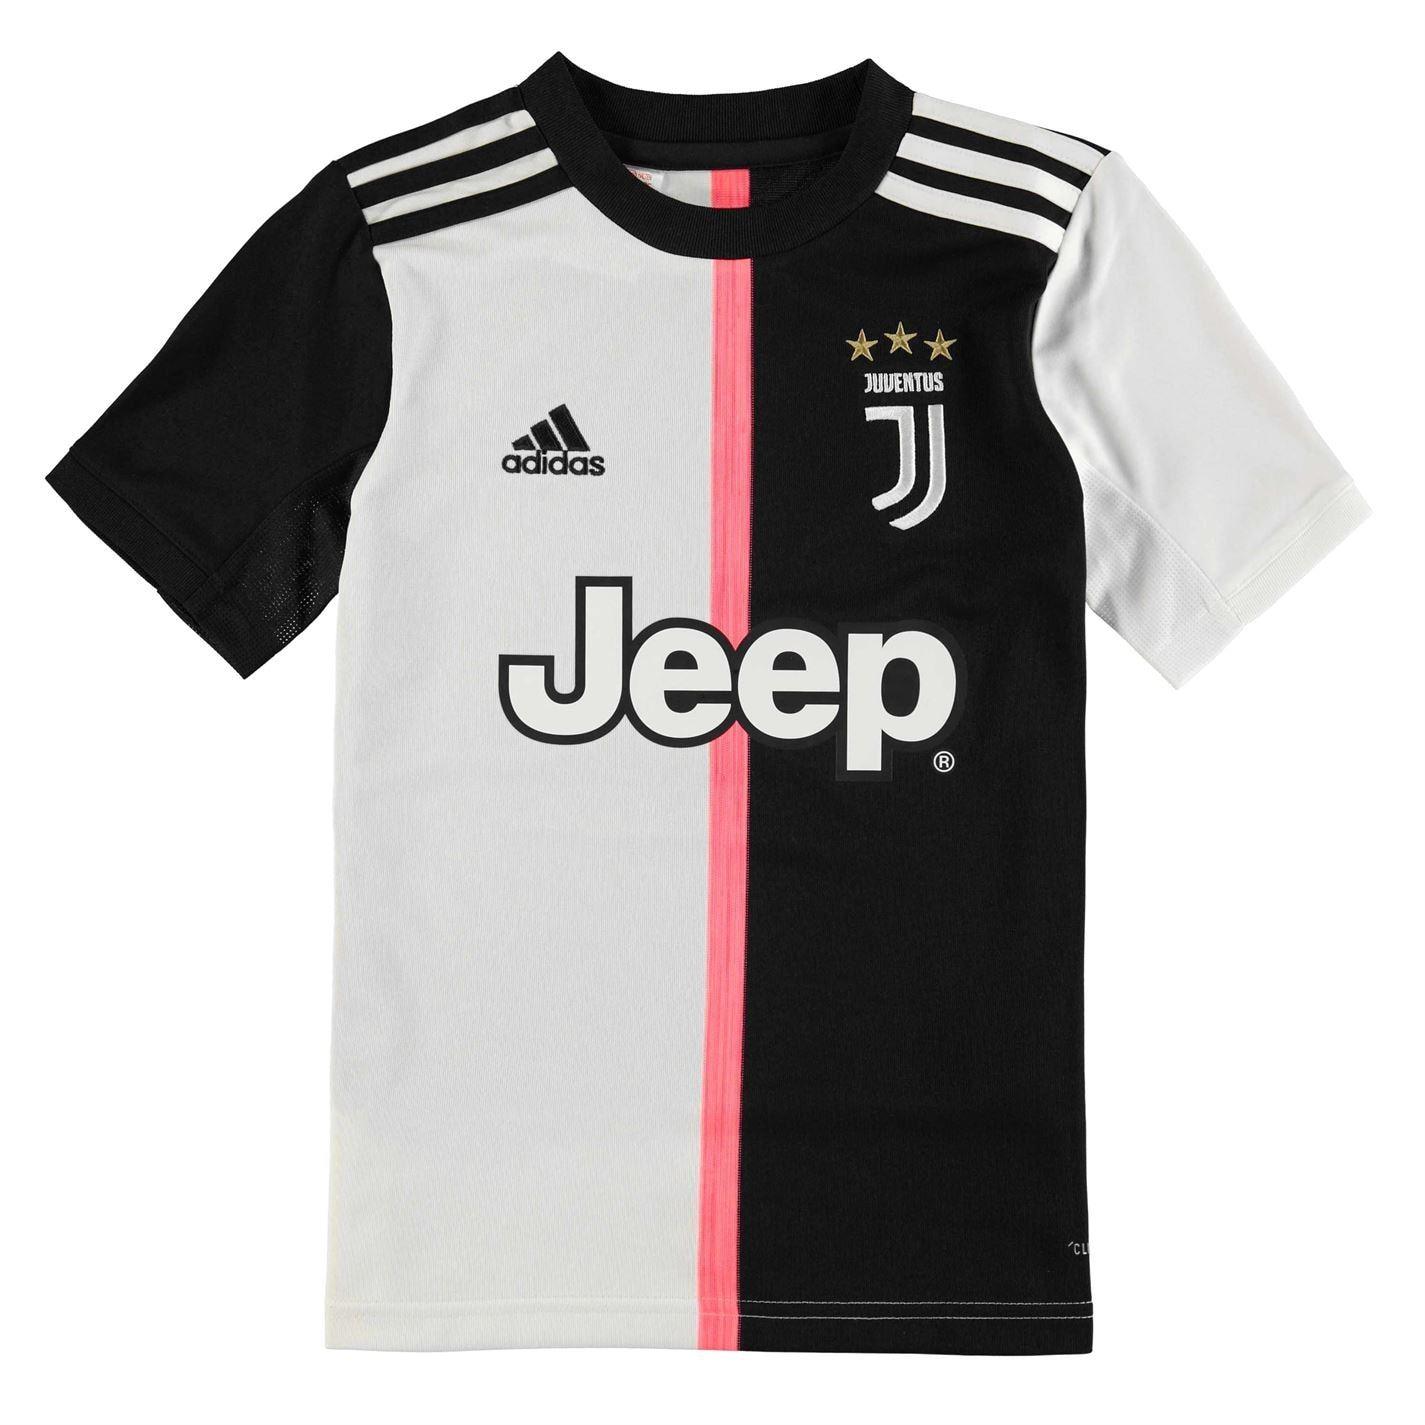 Detalles de Adidas Juventus Home Camisa 2019 20 Junior NegroBlanco Fútbol Jersey